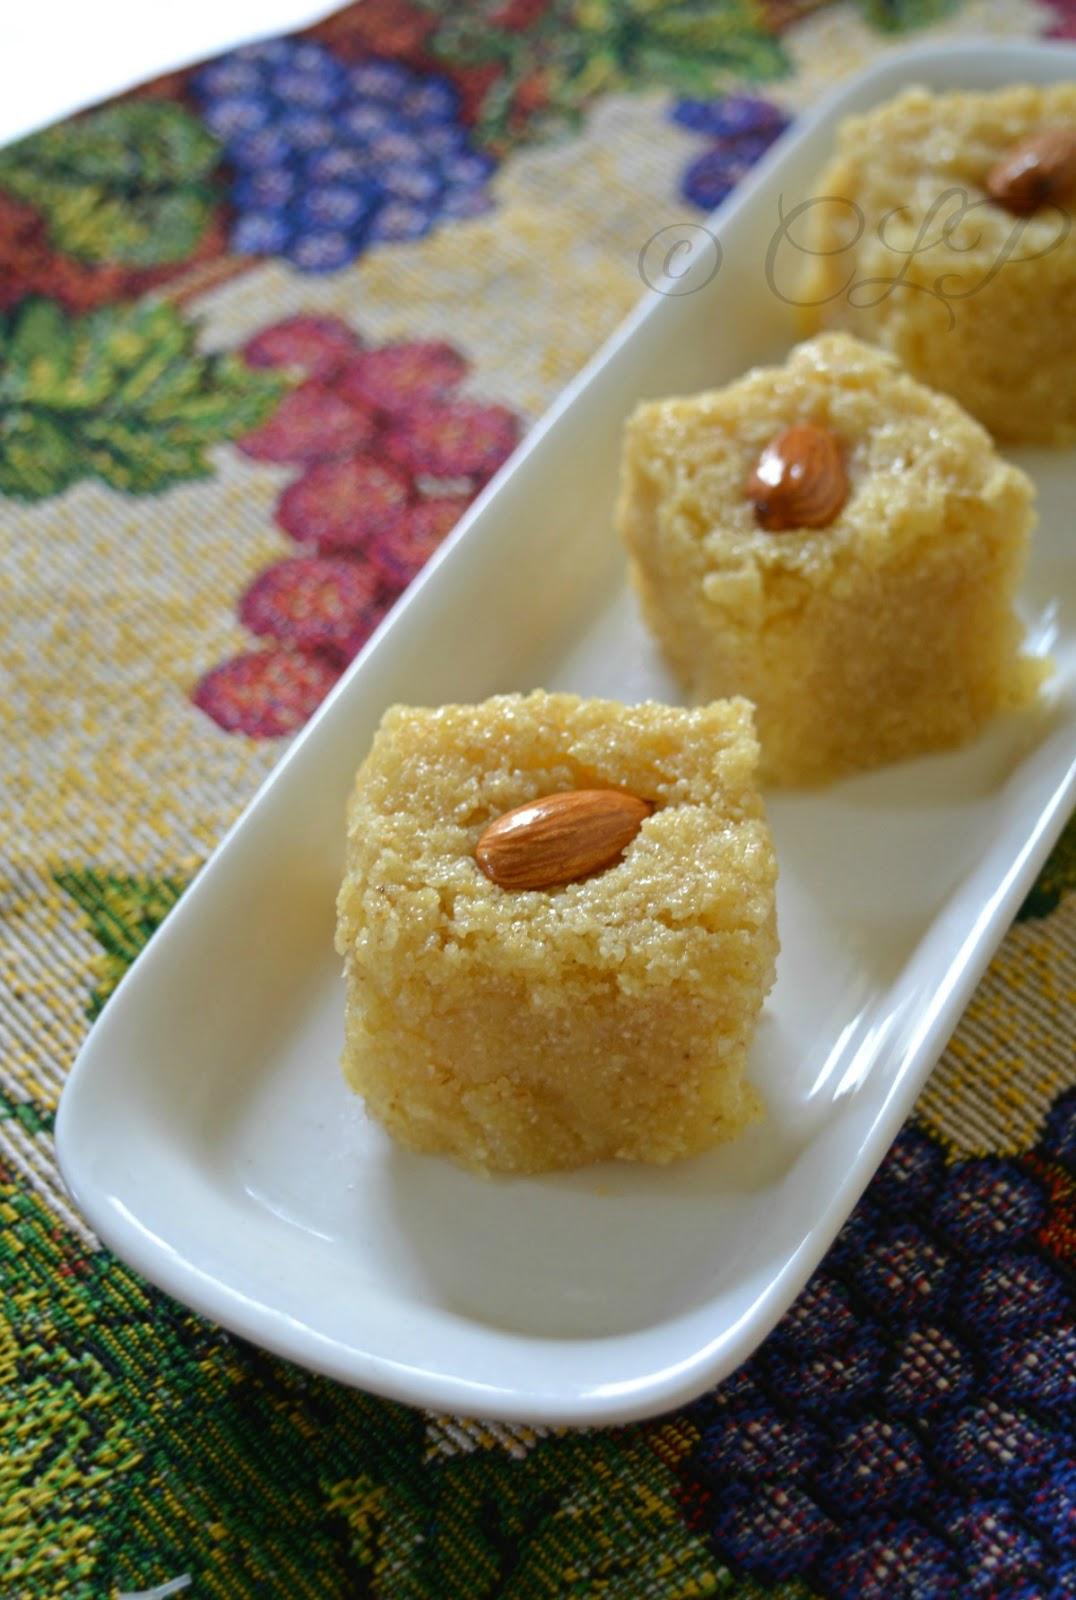 Egyptian Semolina Cake - Basbousa